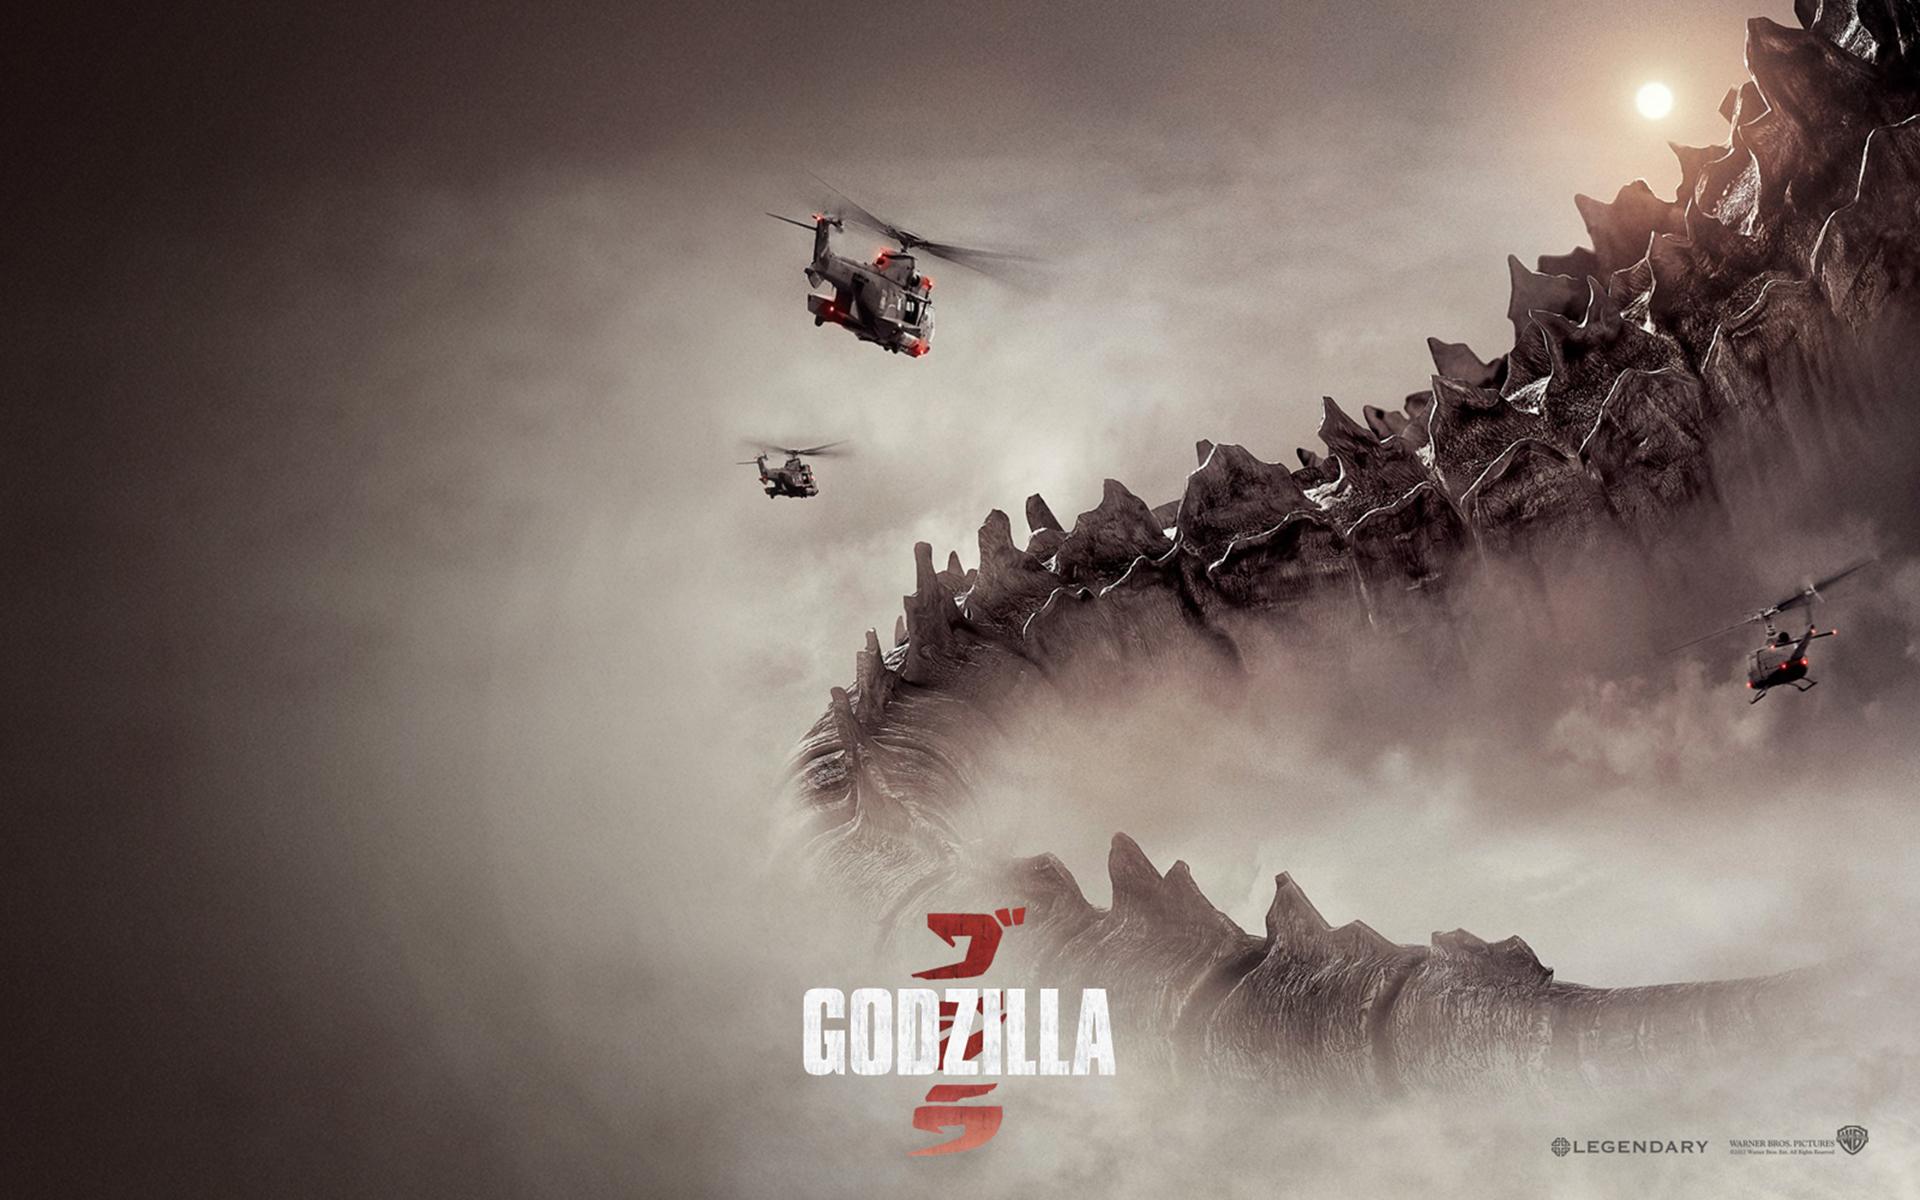 Godzilla 2014 wallpaperjpg 1920x1200